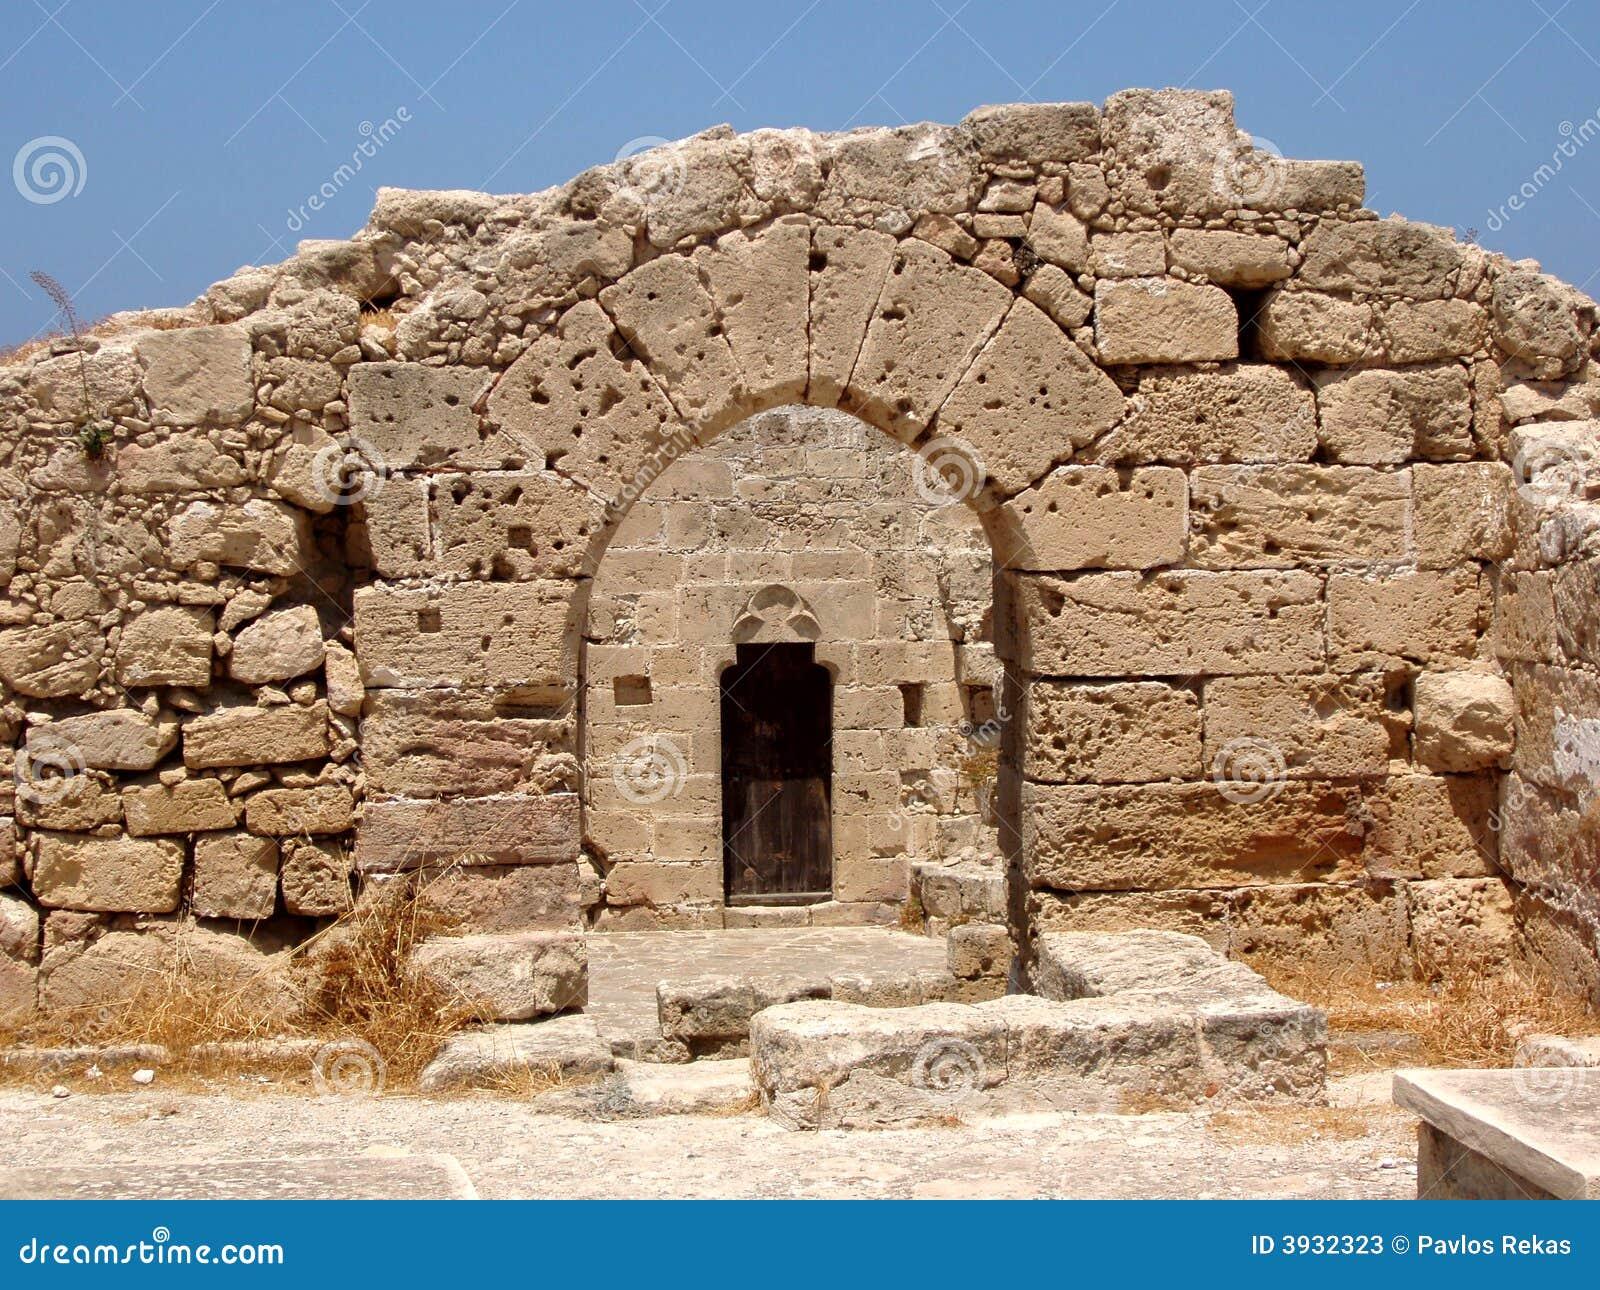 Kyrenia Cyprus  city images : Kyrenia, Cyprus Inside The Kyrenia Castle Stock Photos Image ...